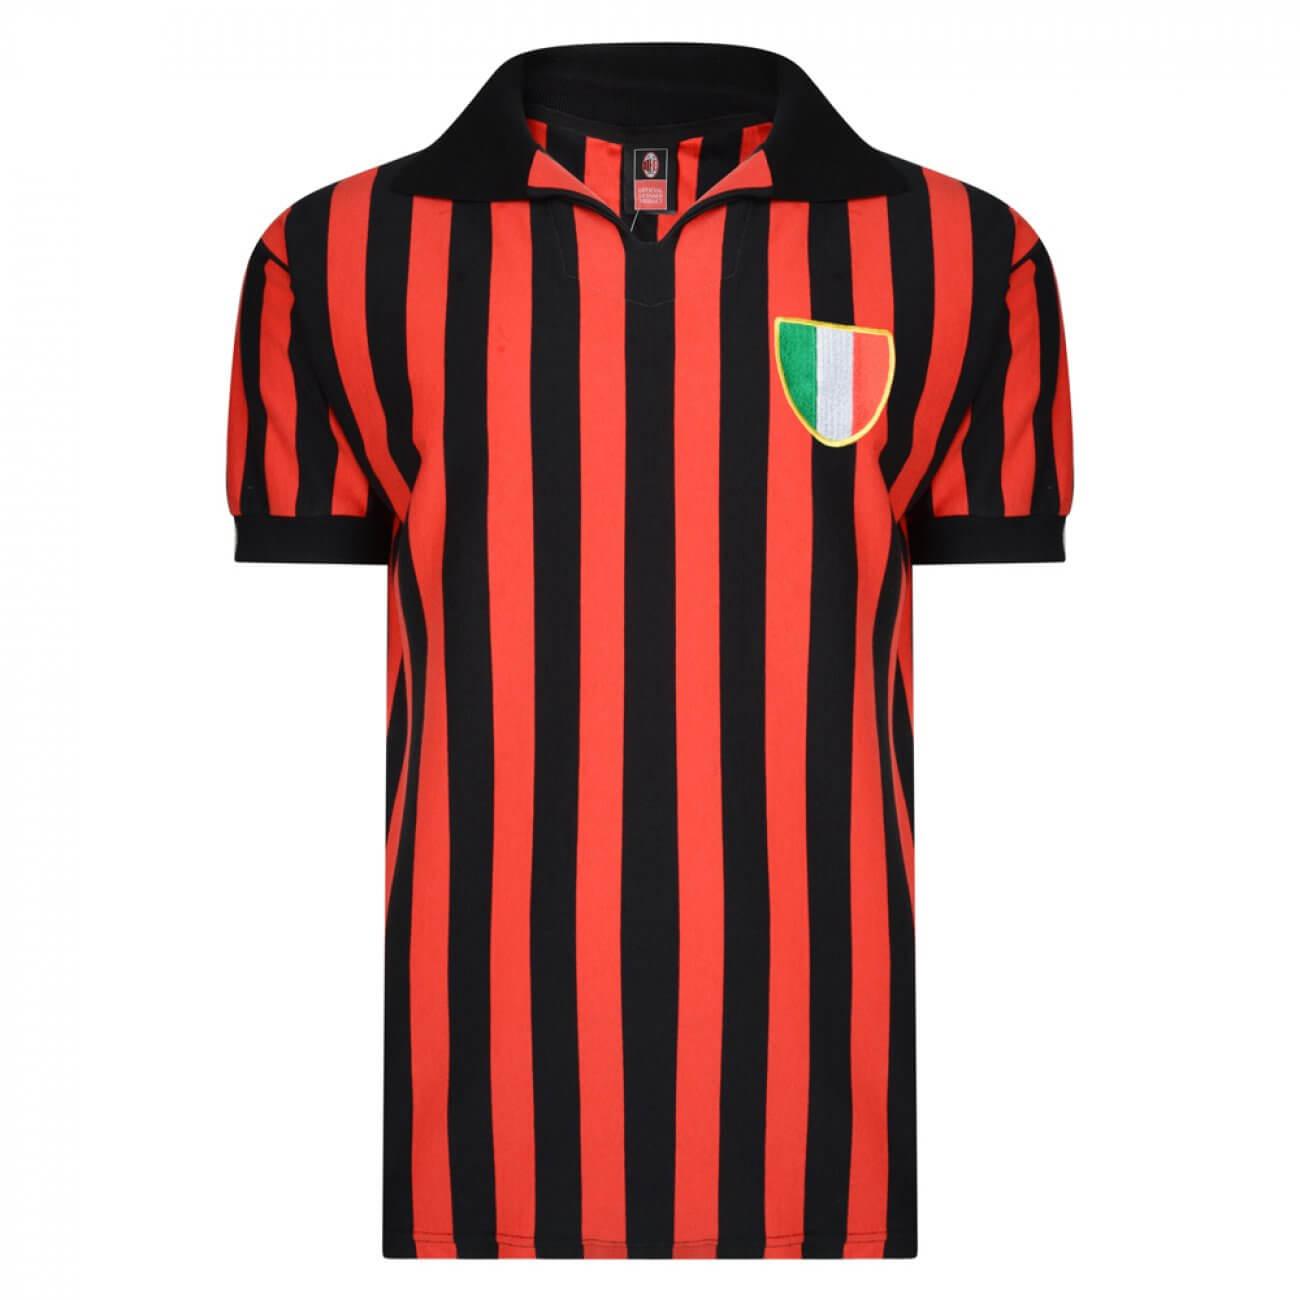 Maillot rétro AC Milan 1962/63